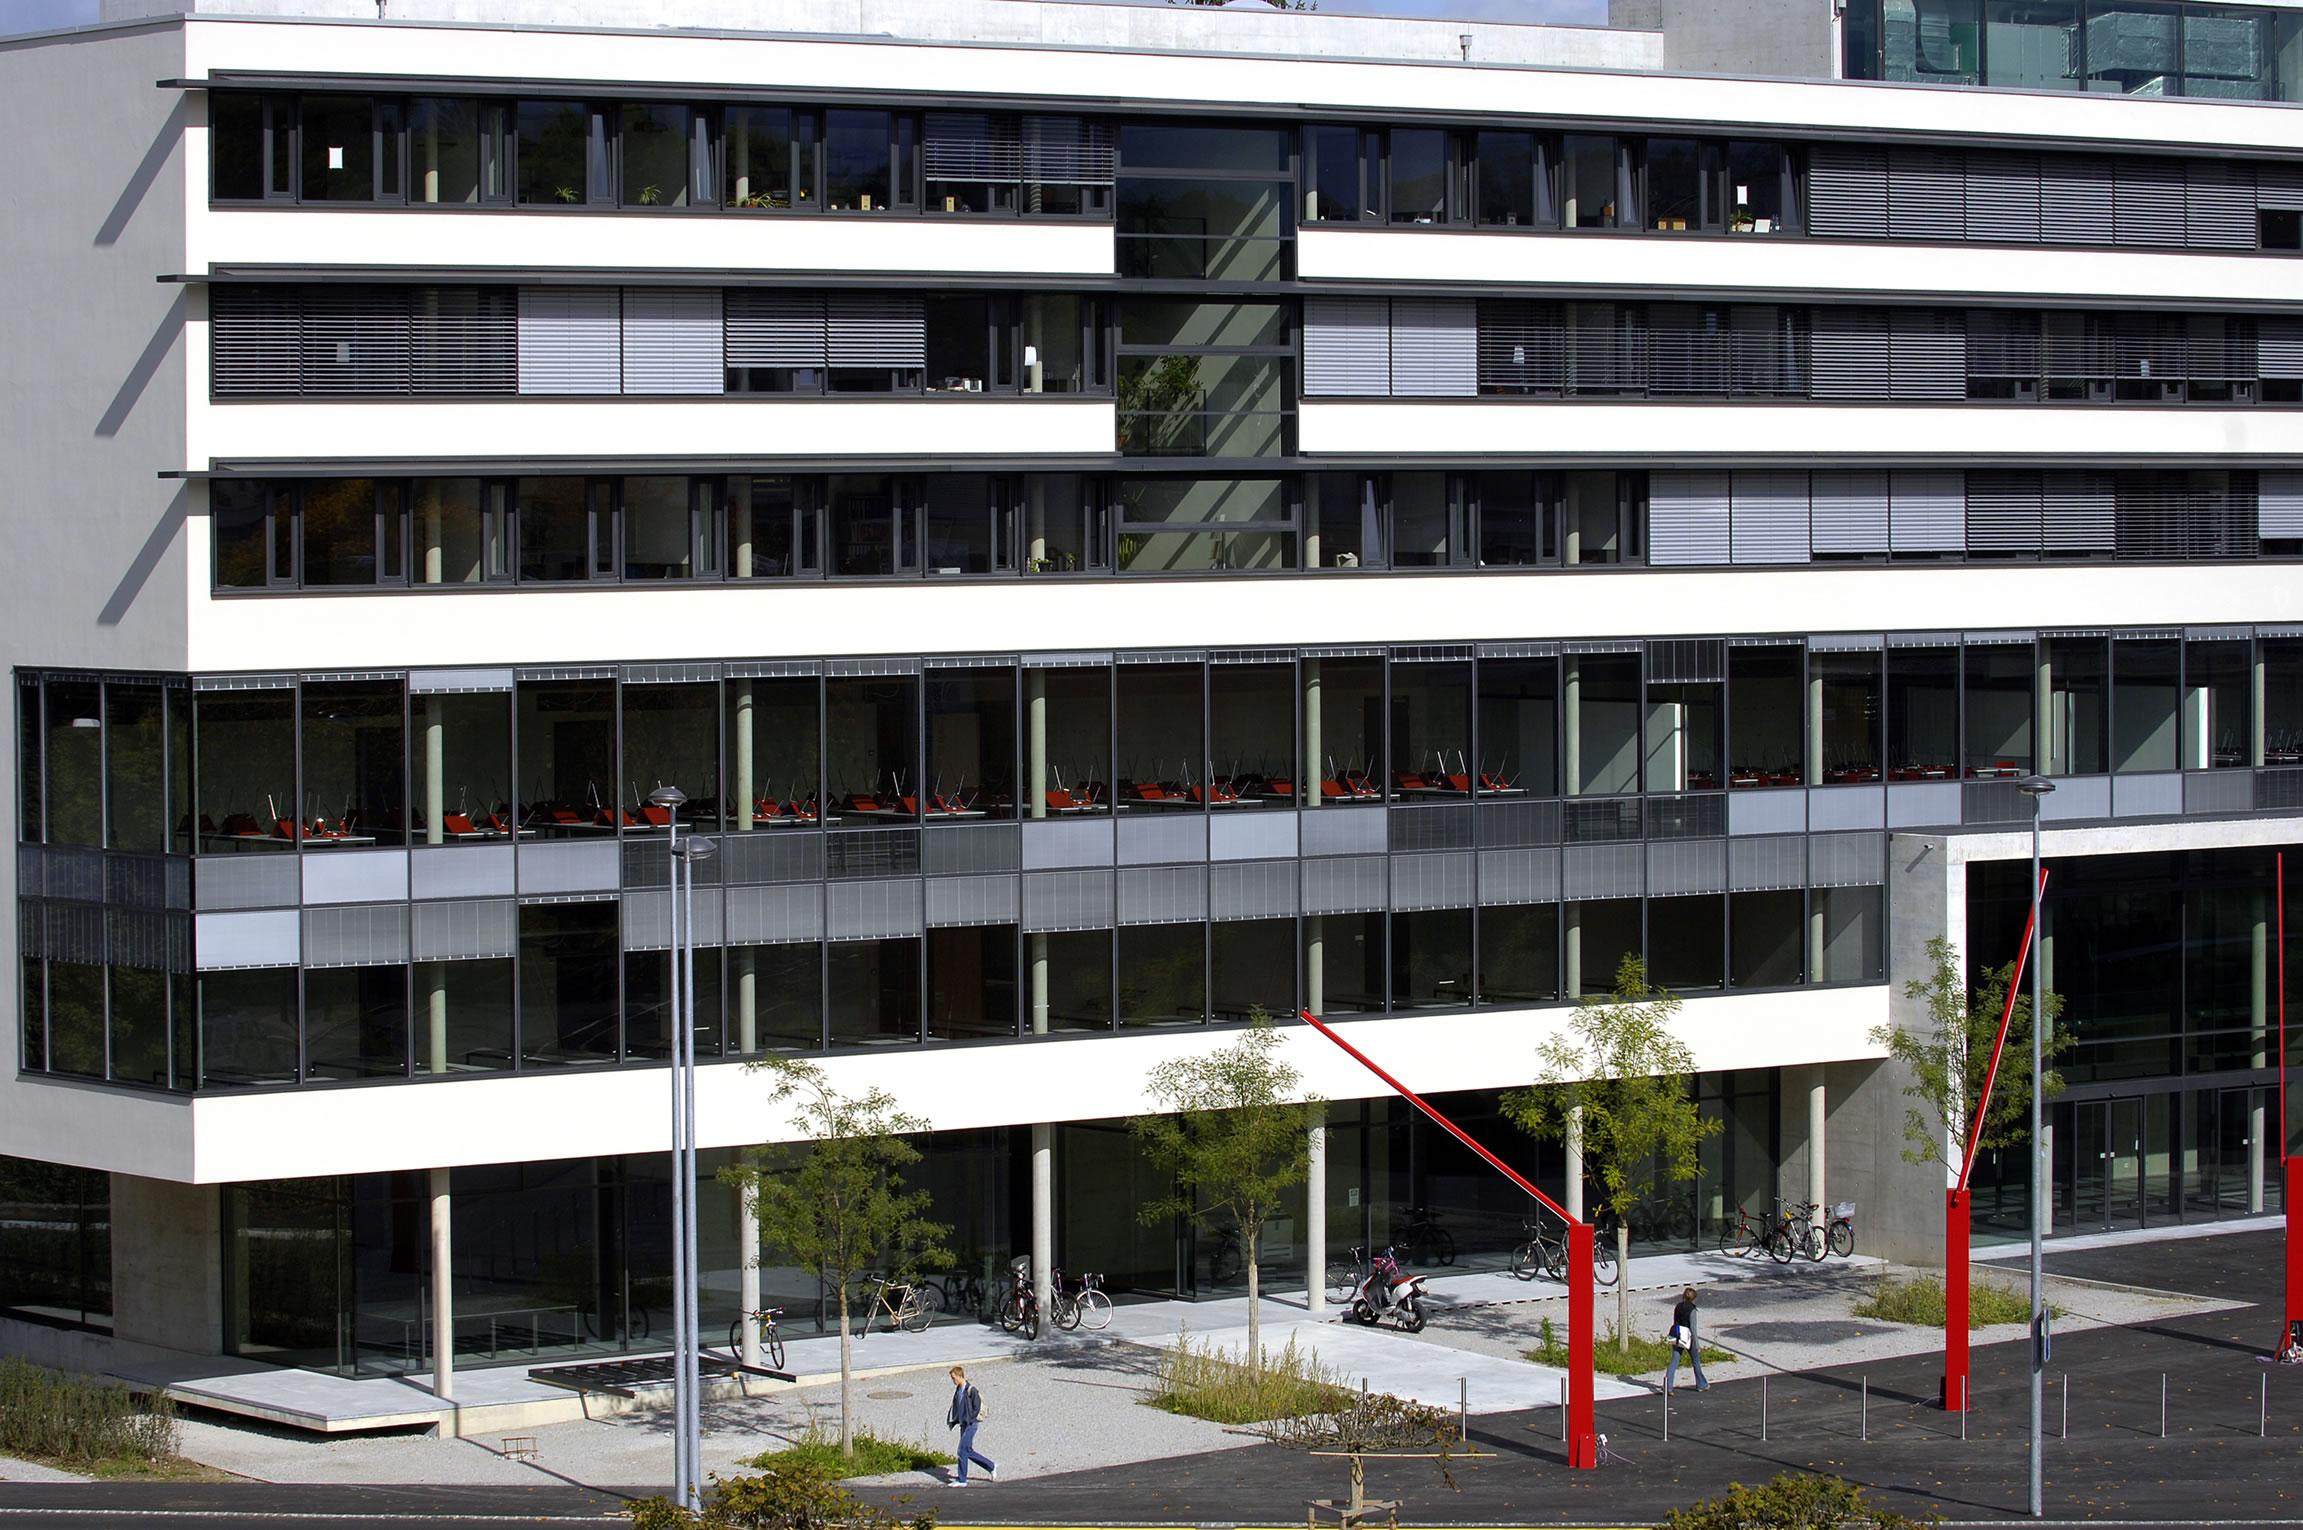 Aktuell universit t freiburg p rolles2 eine moderne for Moderne infrastruktur